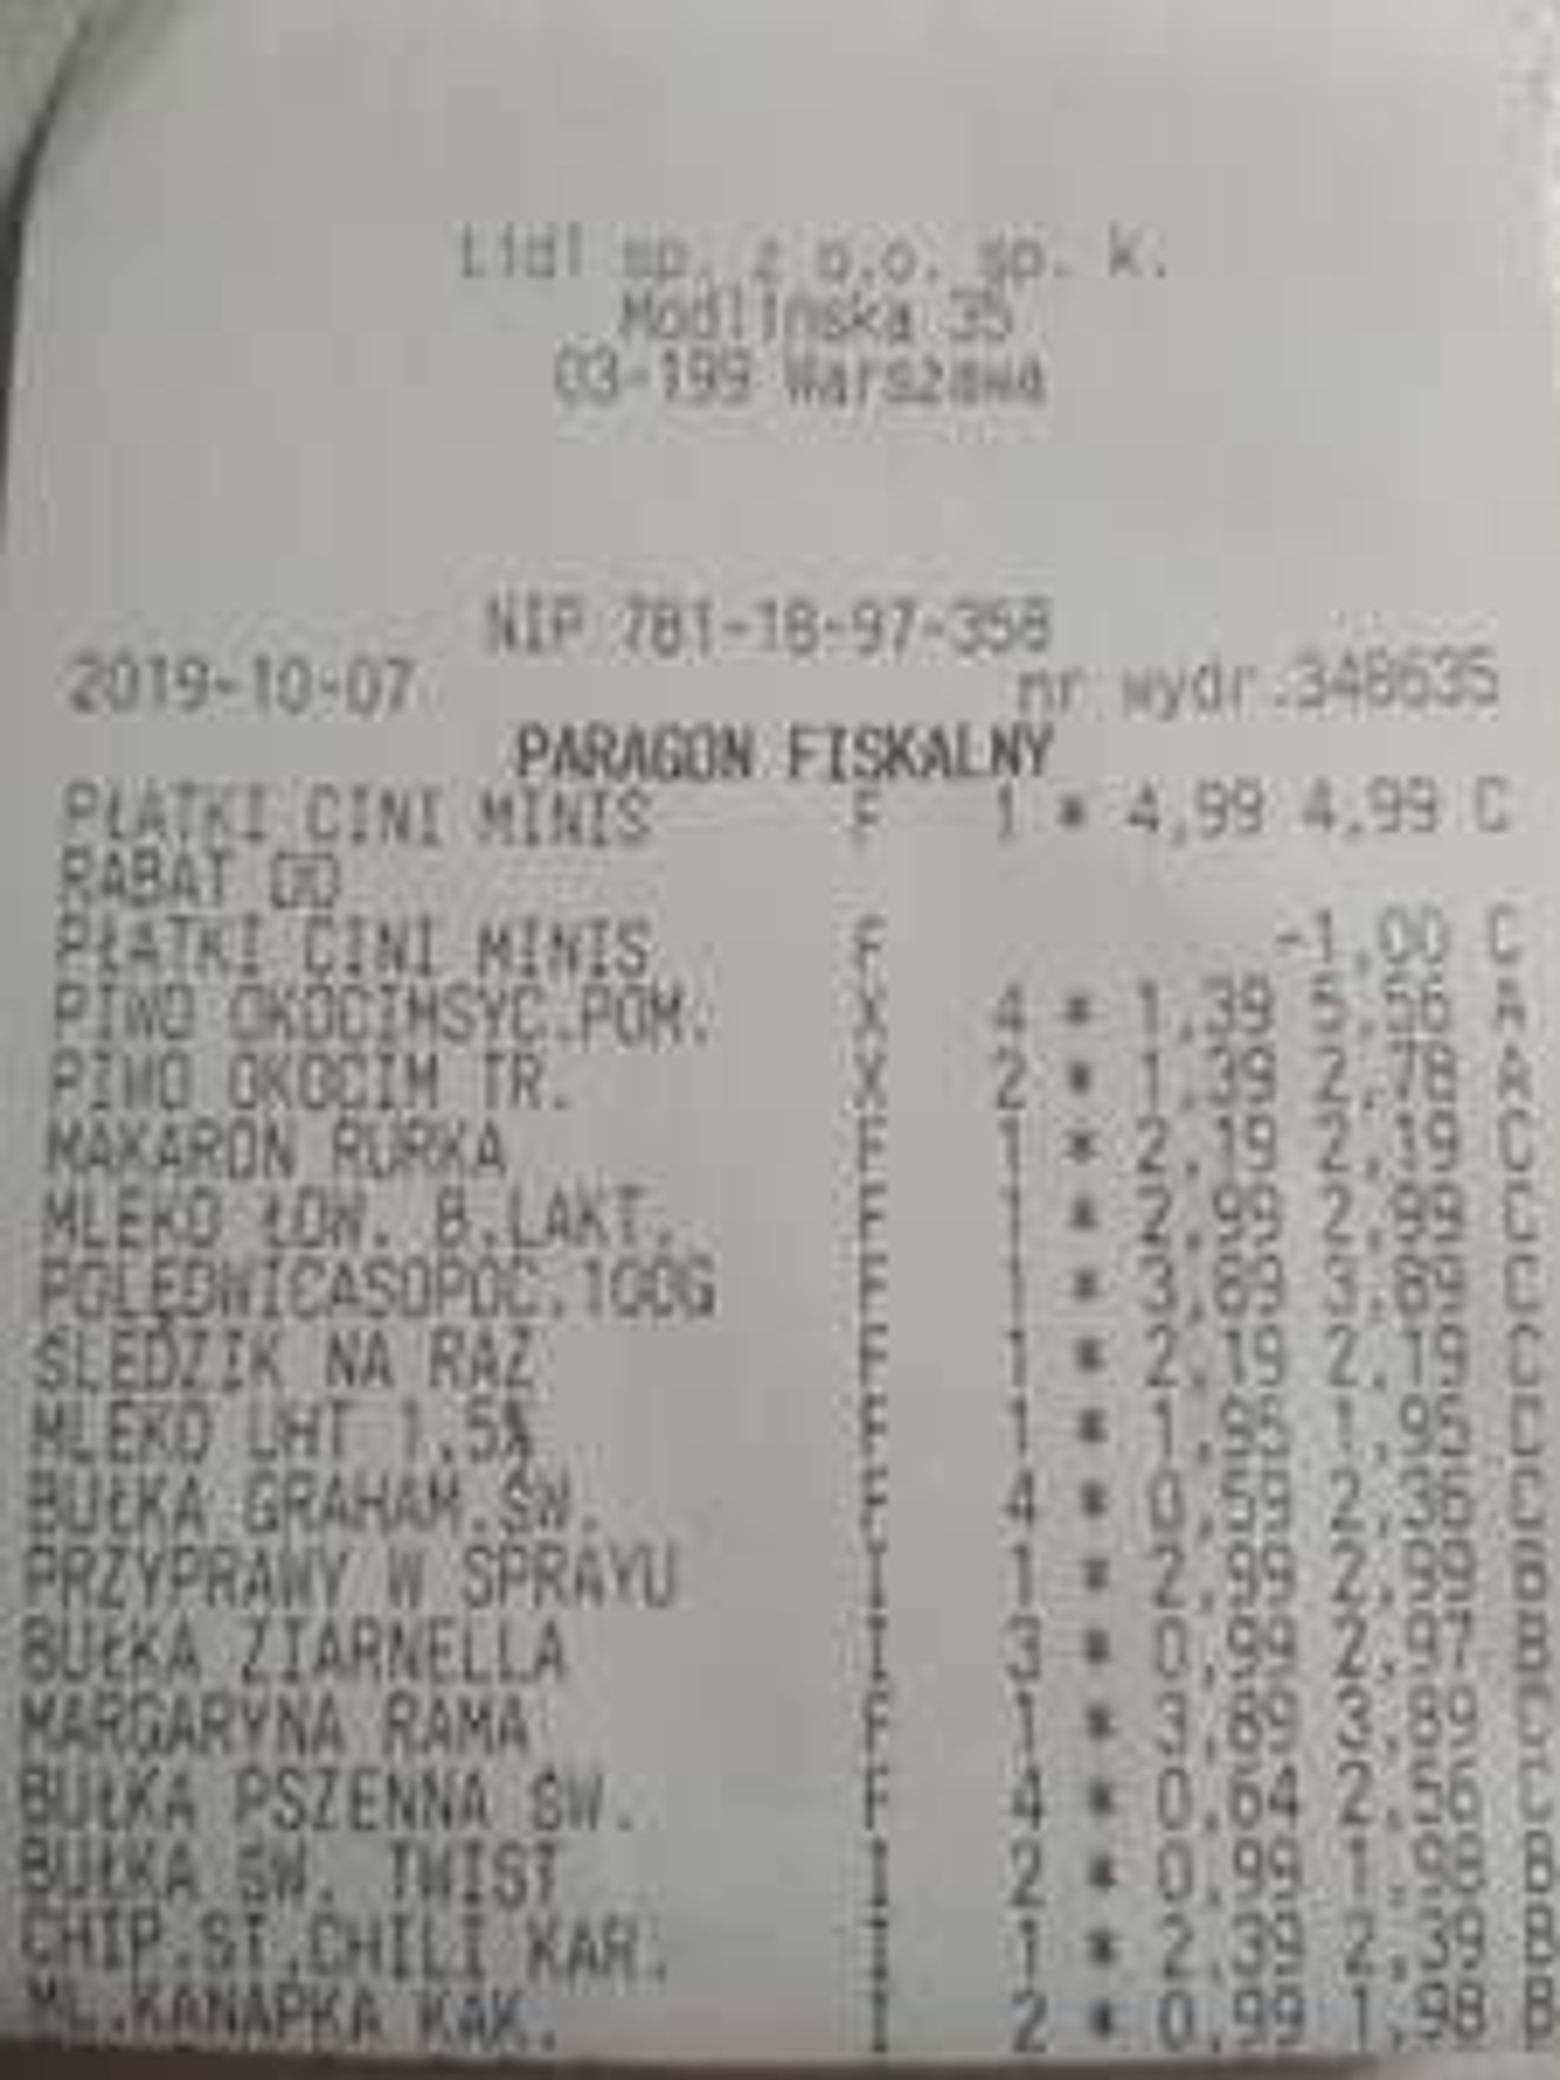 Lidl - piwo radler Okocim 1.39zl